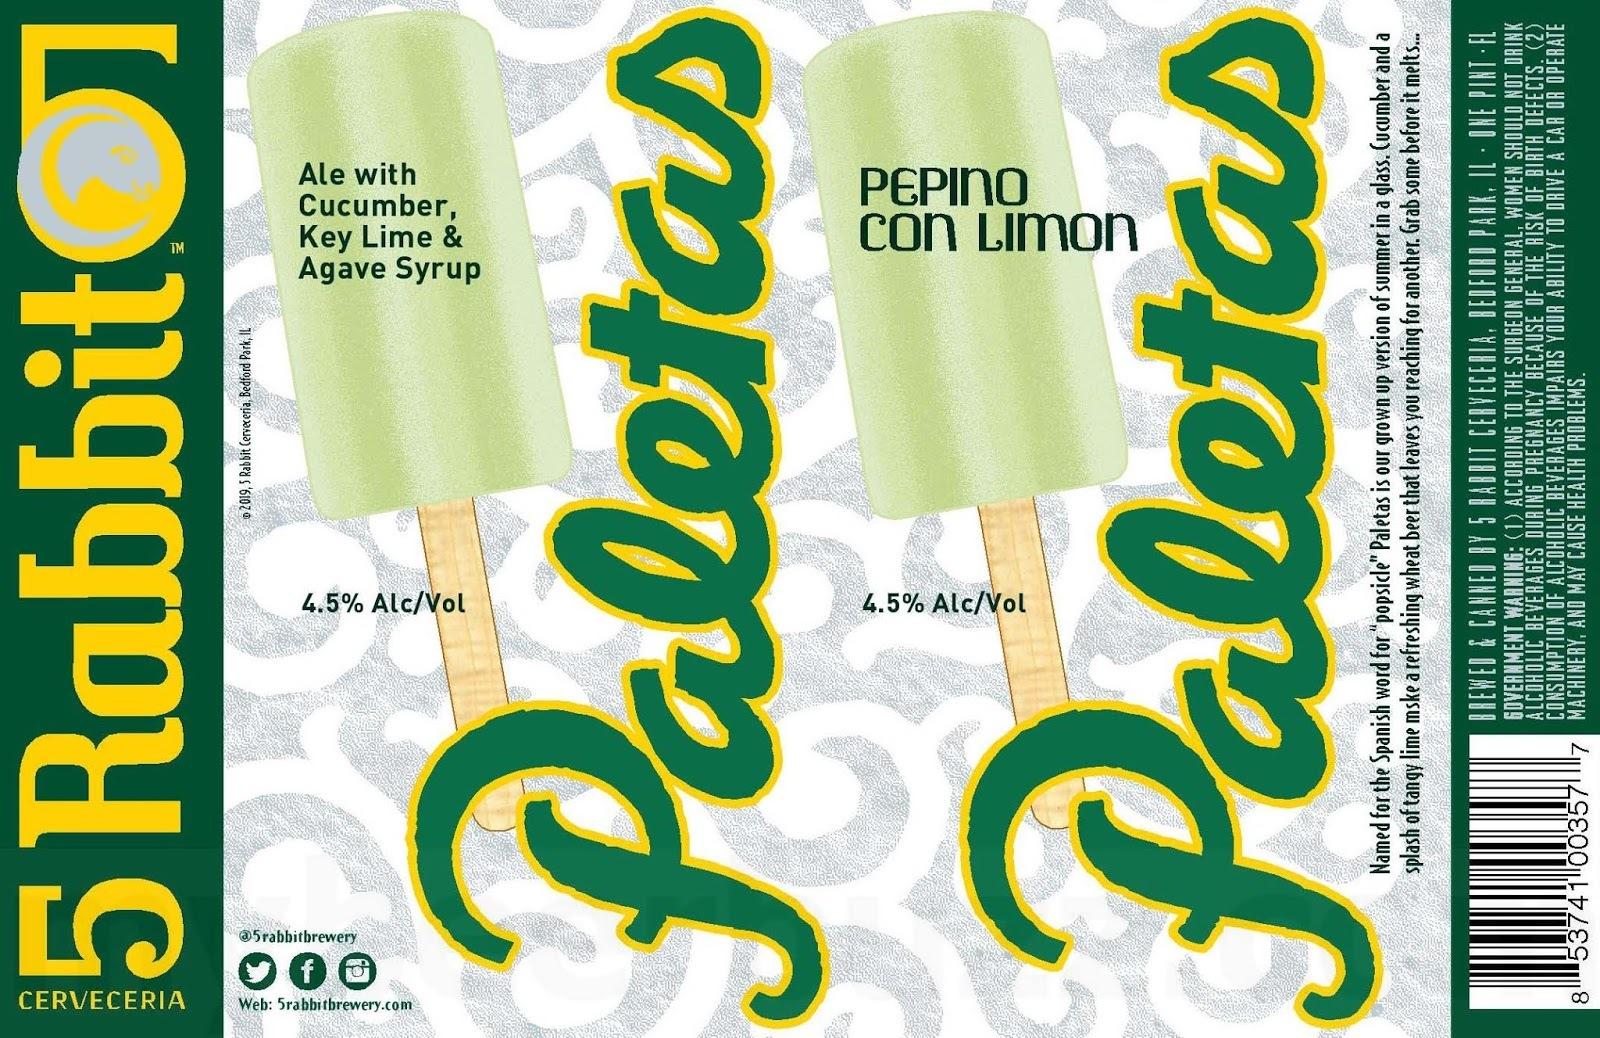 5 Rabbit Pepino Con Limon Paletas beer Label Full Size